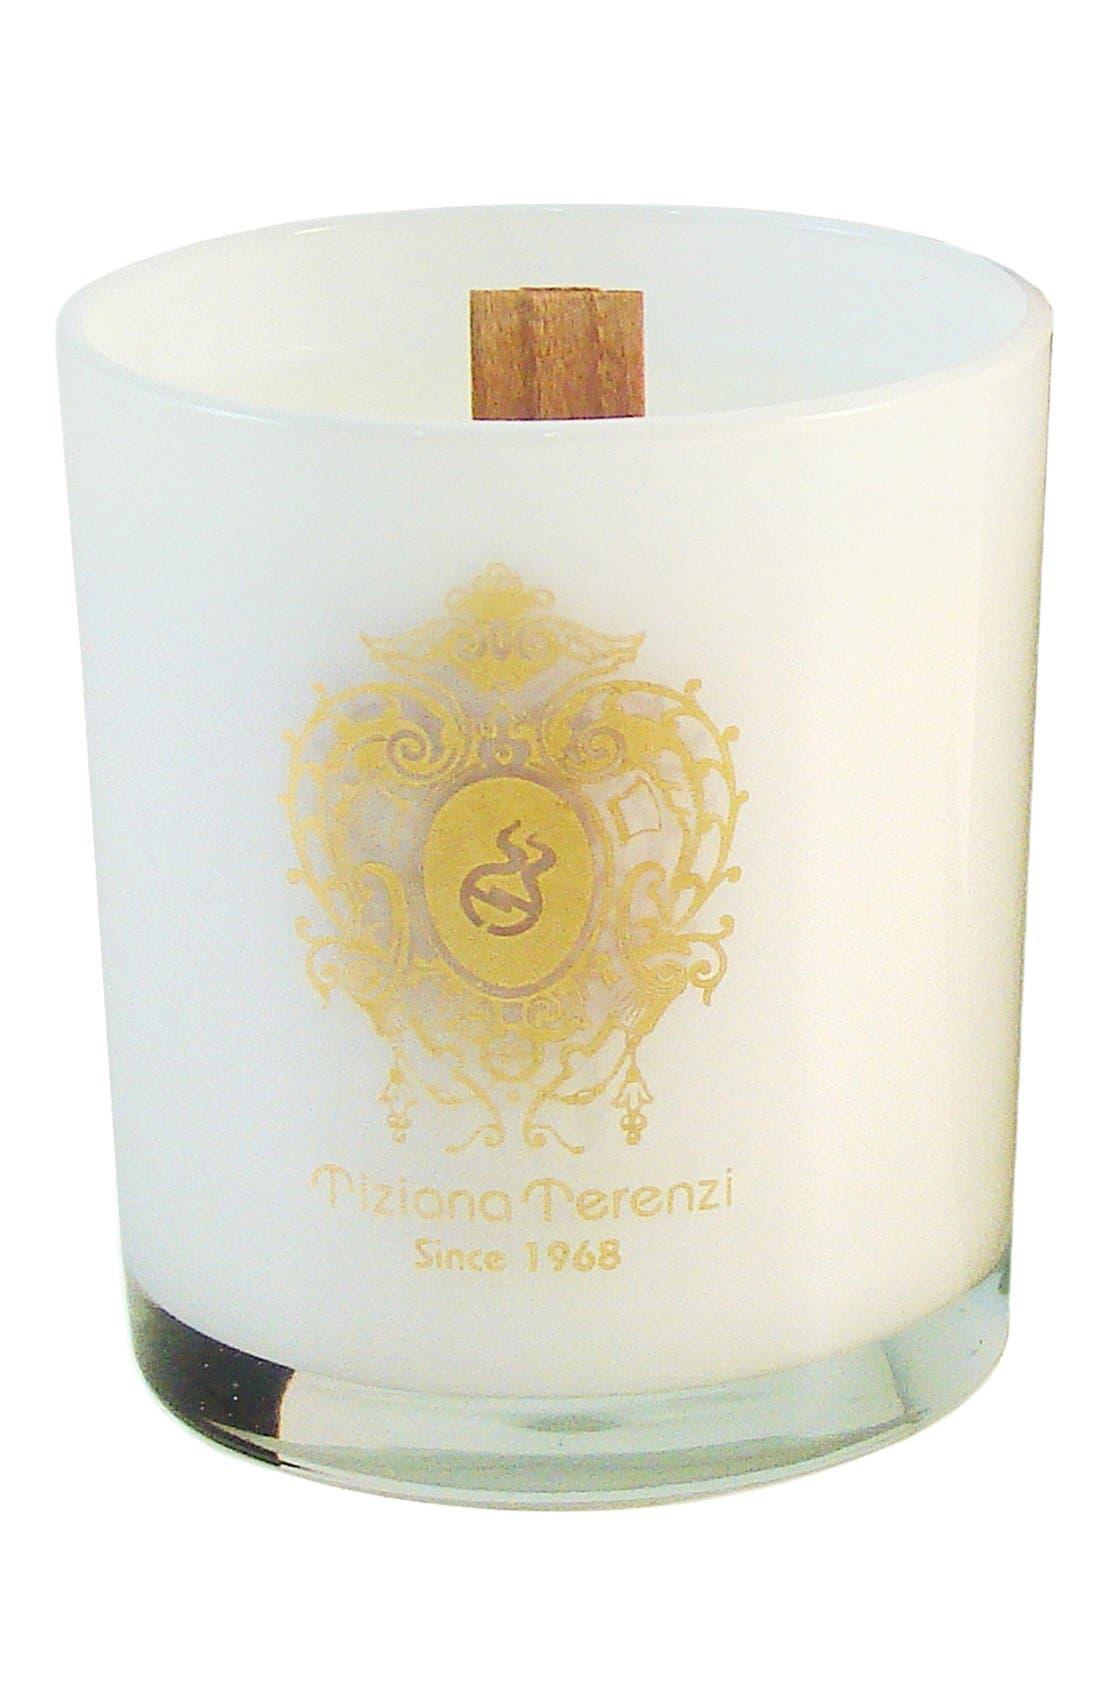 Main Image - Tiziana Terenzi 'Arethusa' Single Wick Gioconda Candle